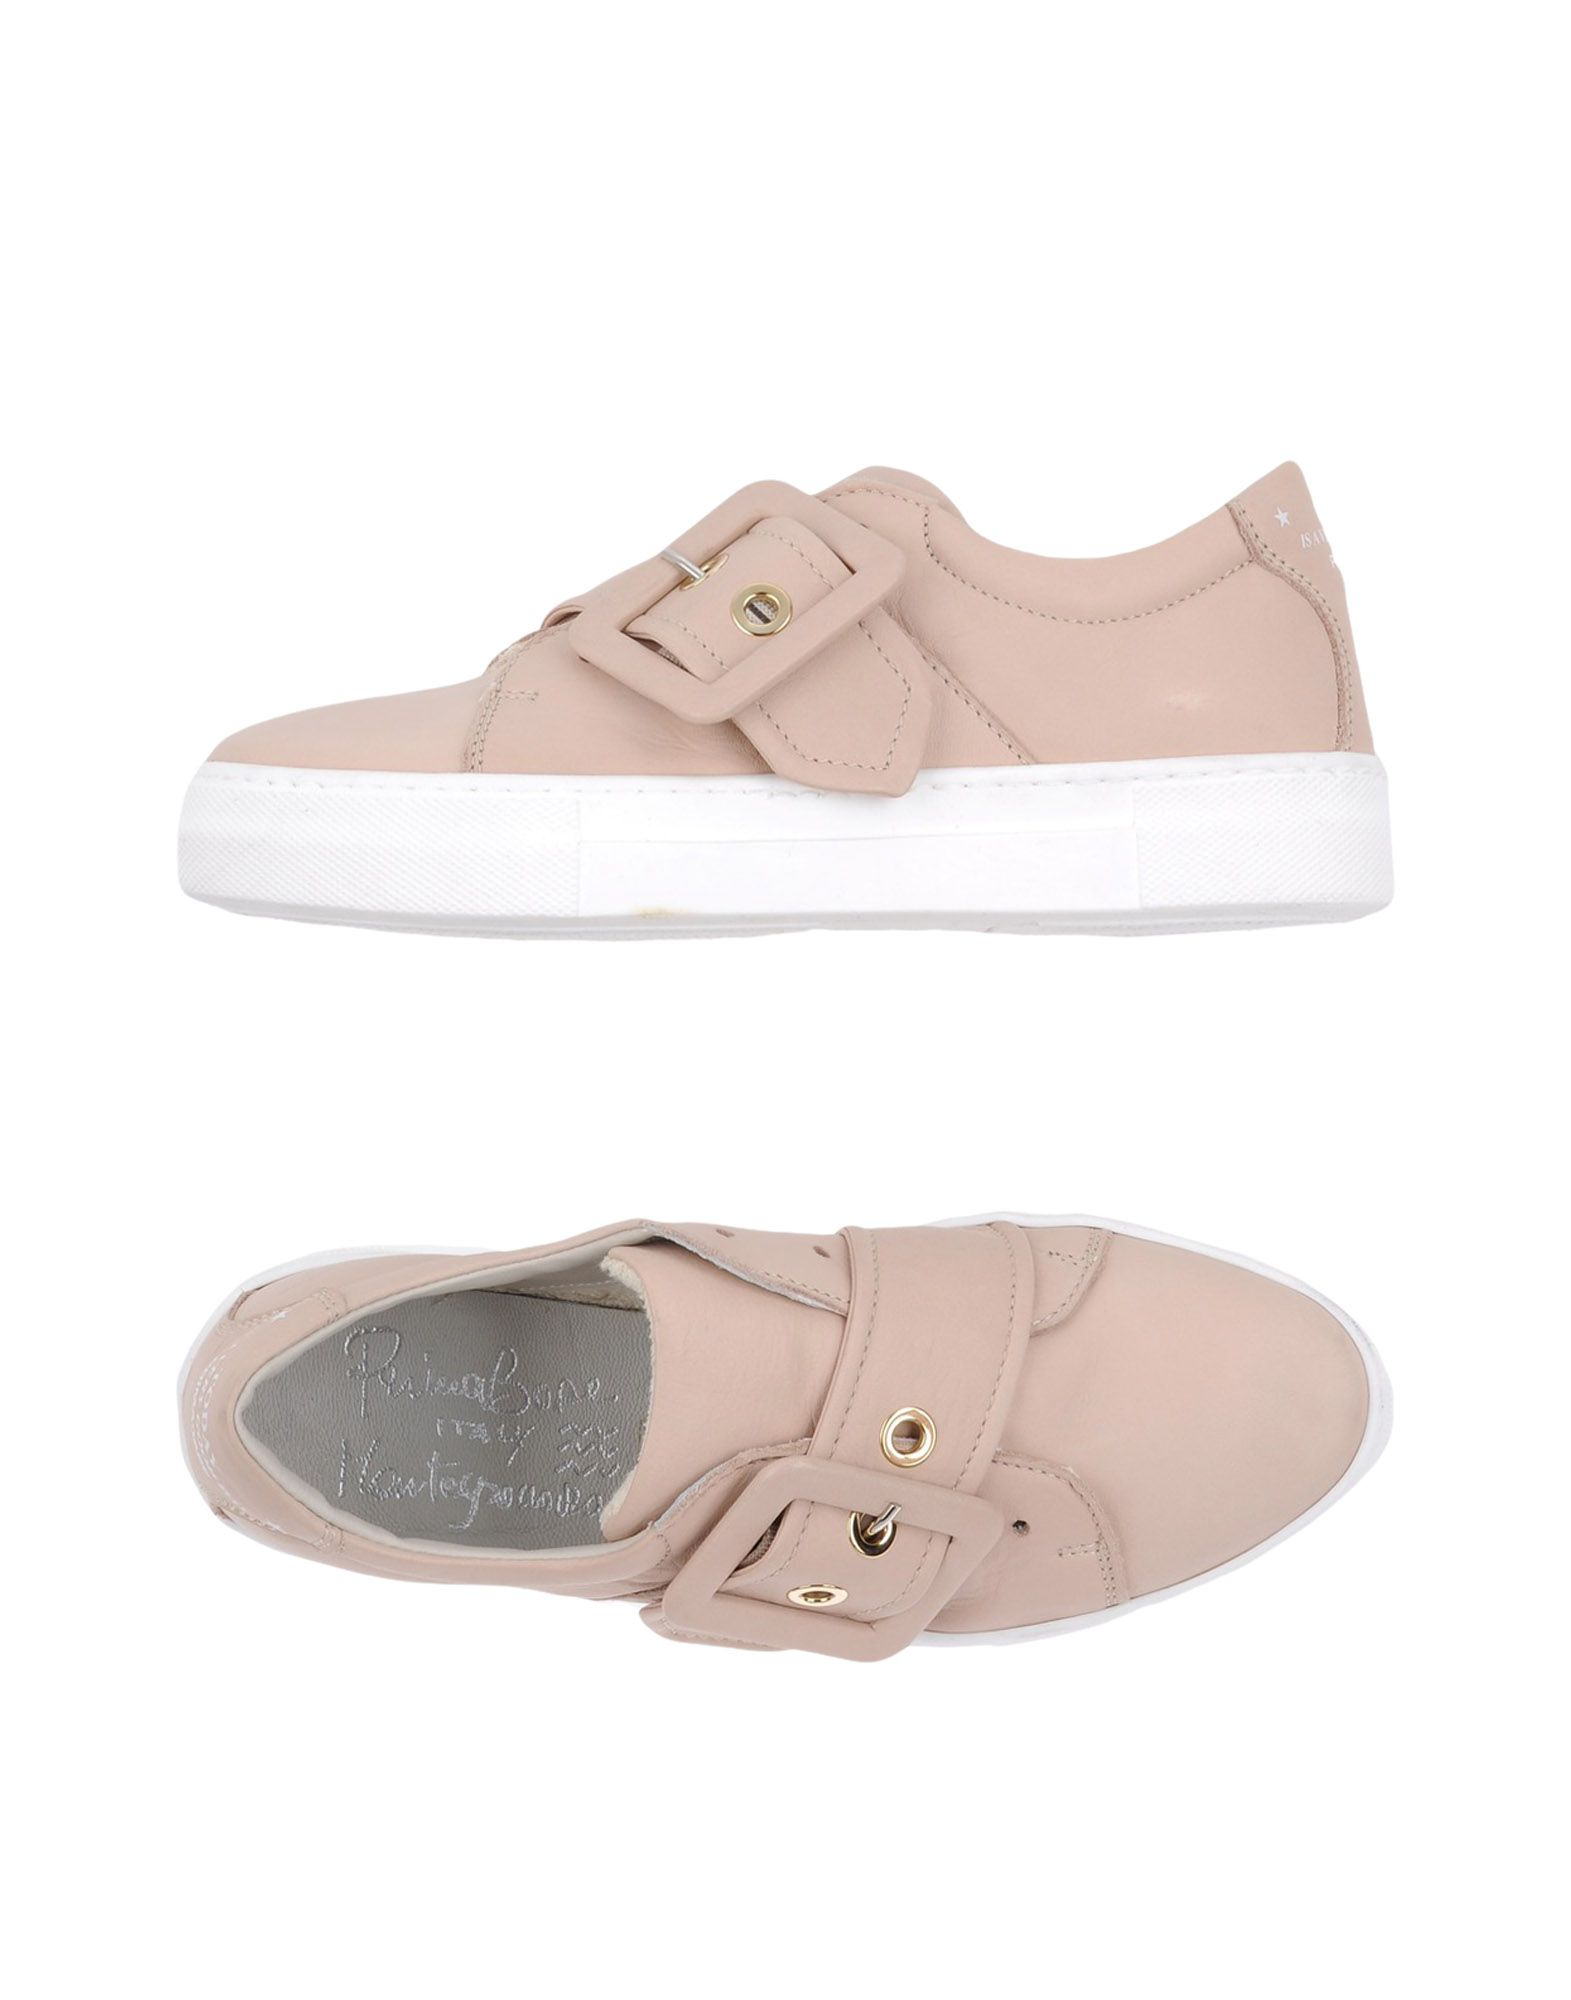 Primabase Sneakers 11332868DC Damen  11332868DC Sneakers Heiße Schuhe e8416d